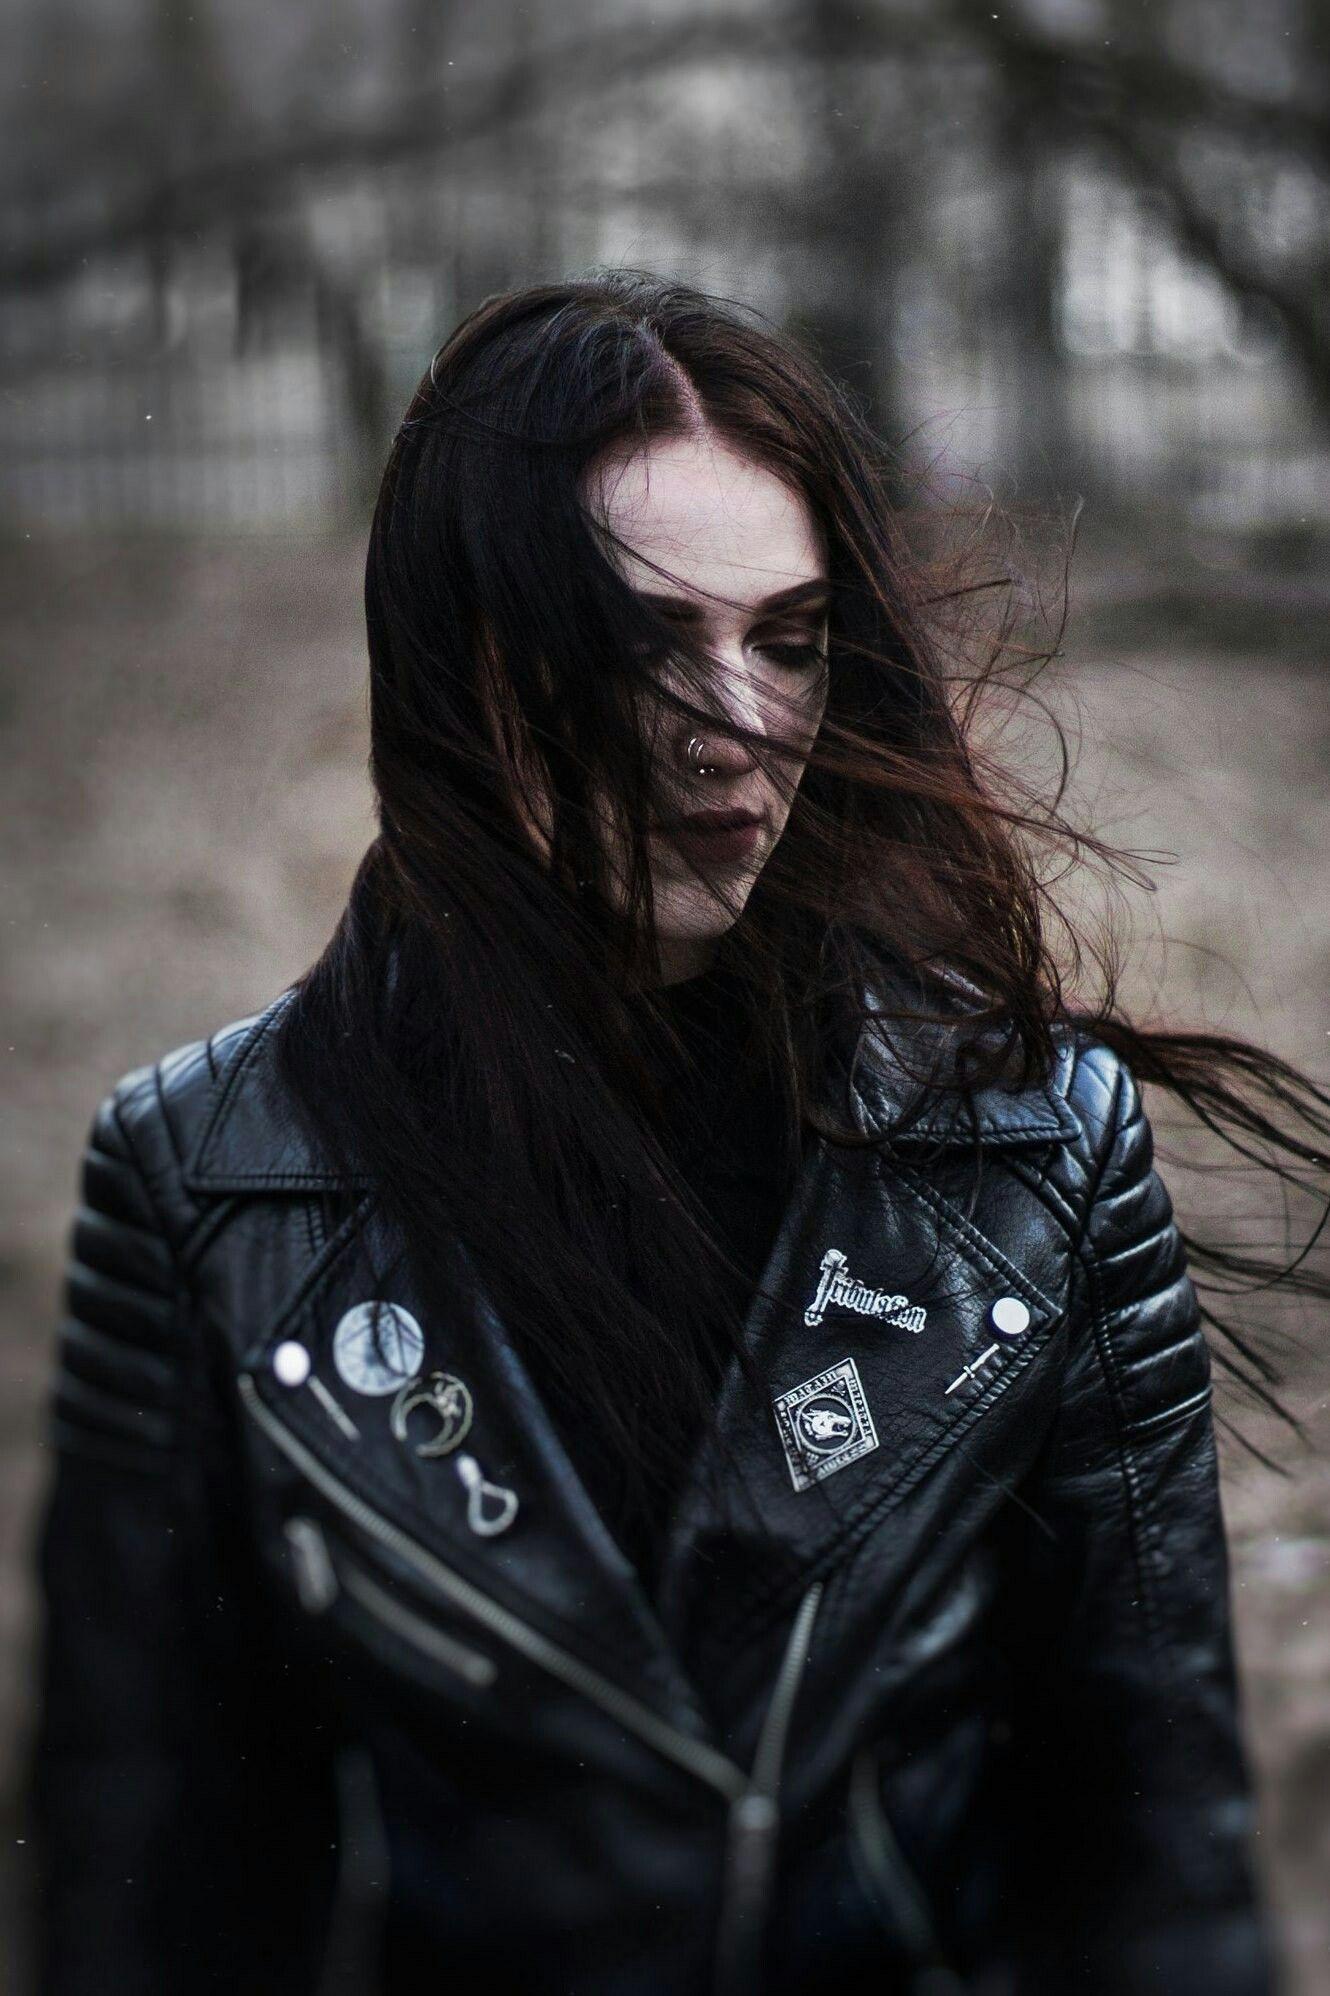 Pin by Katrin666 on Metalhead Girl | Black metal girl